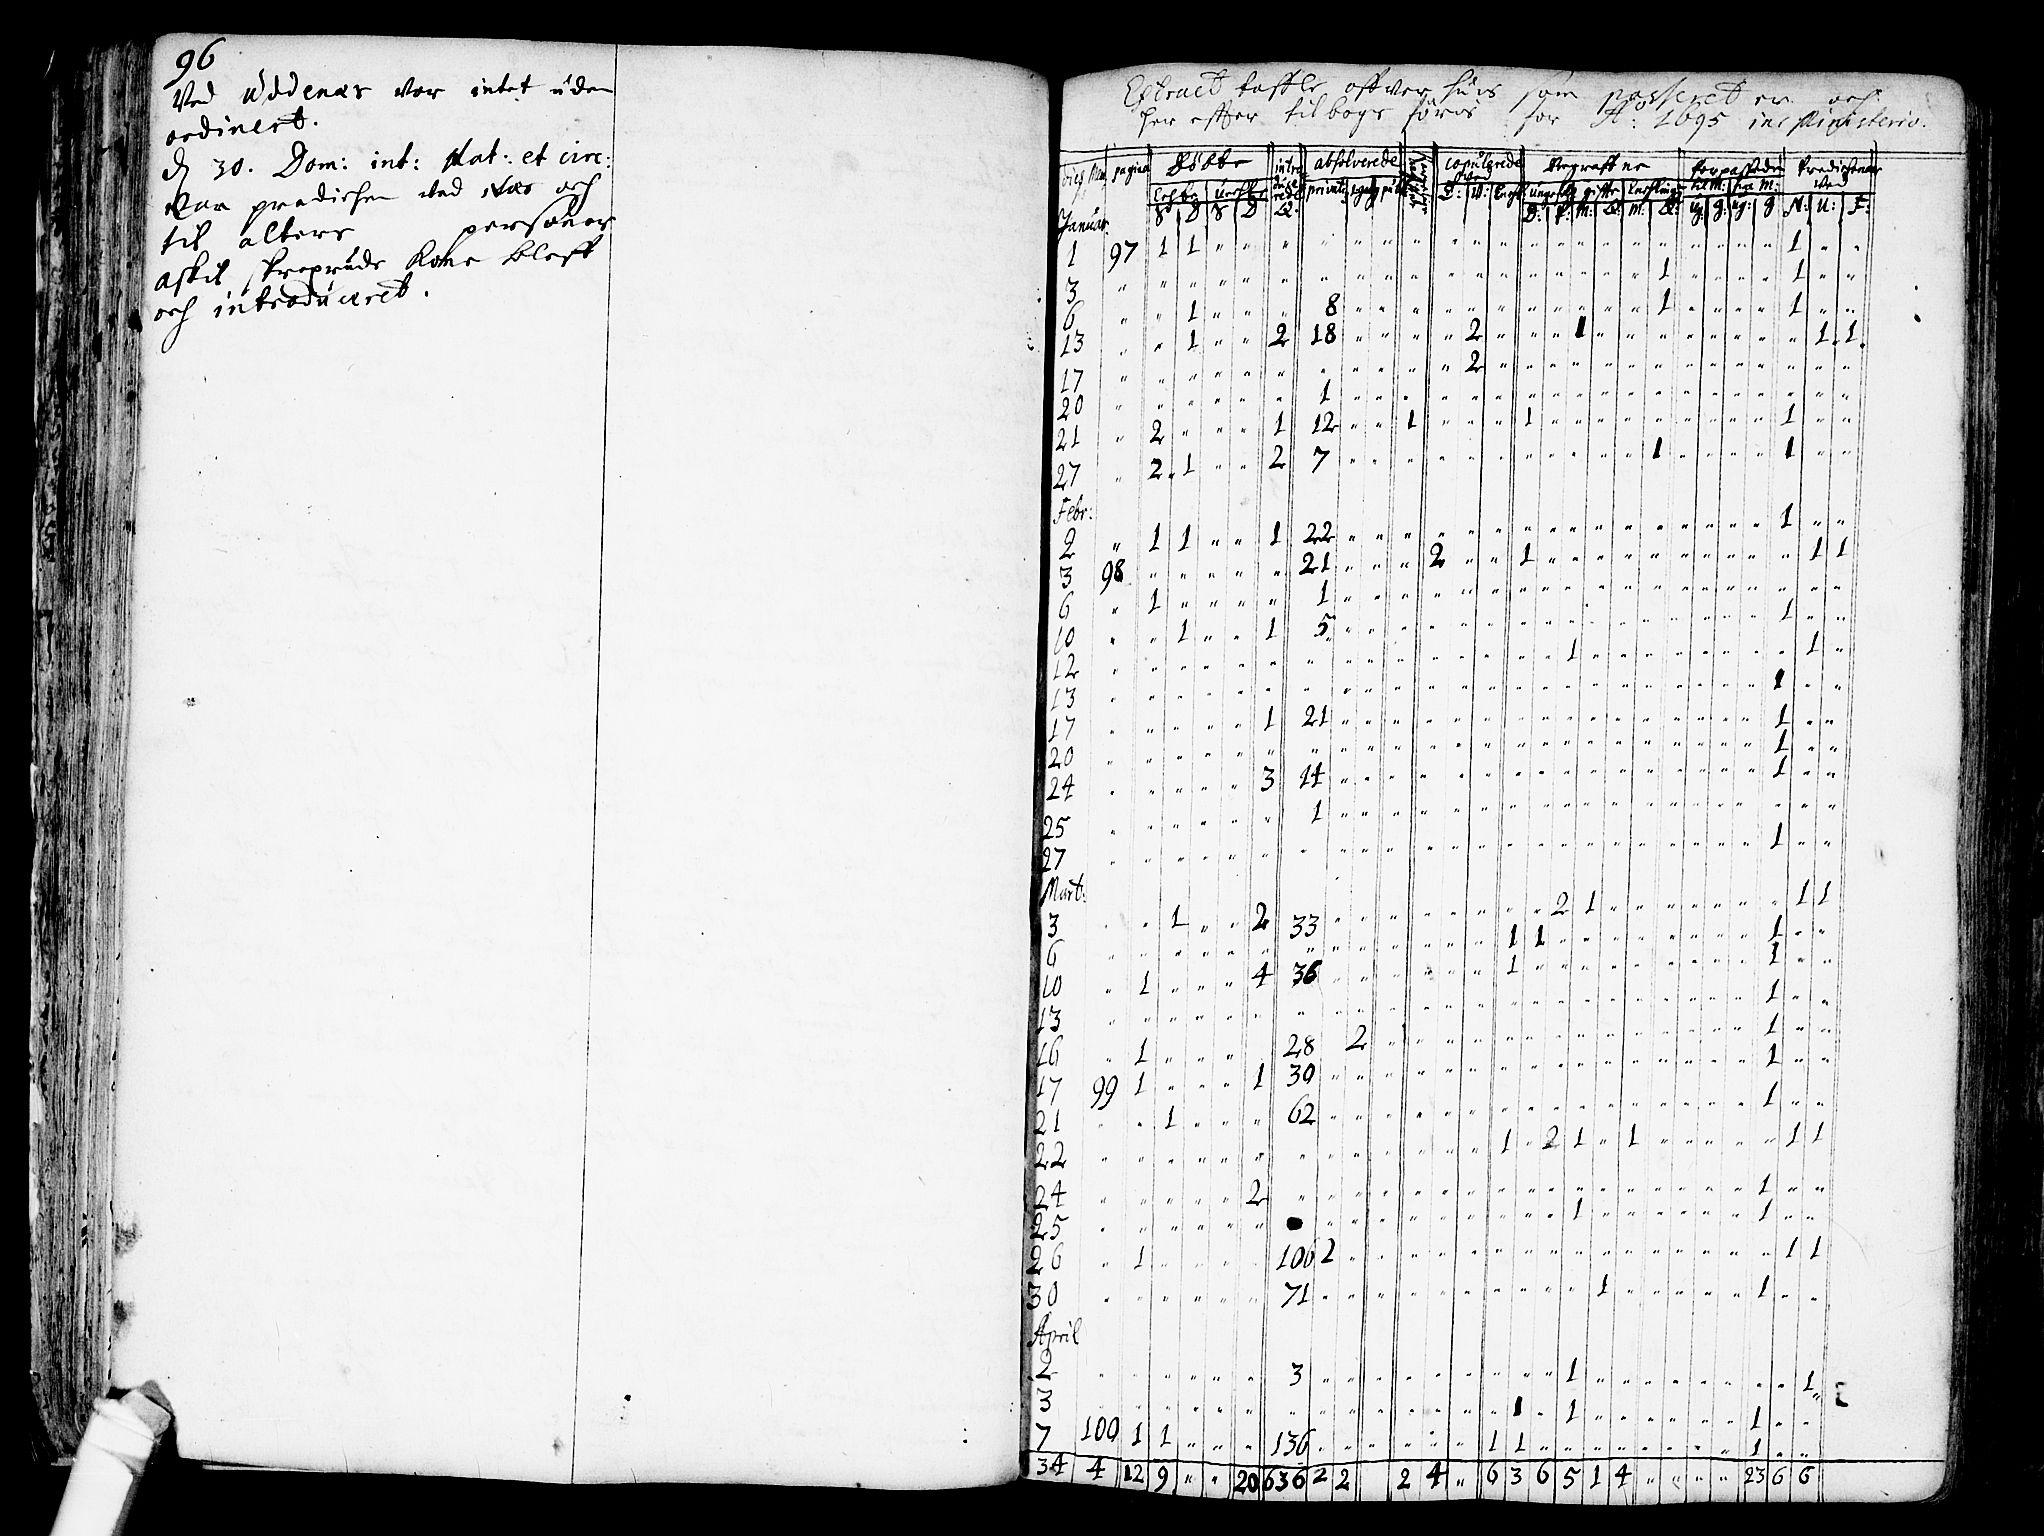 SAO, Nes prestekontor Kirkebøker, F/Fa/L0001: Parish register (official) no. I 1, 1689-1716, p. 96a-96b